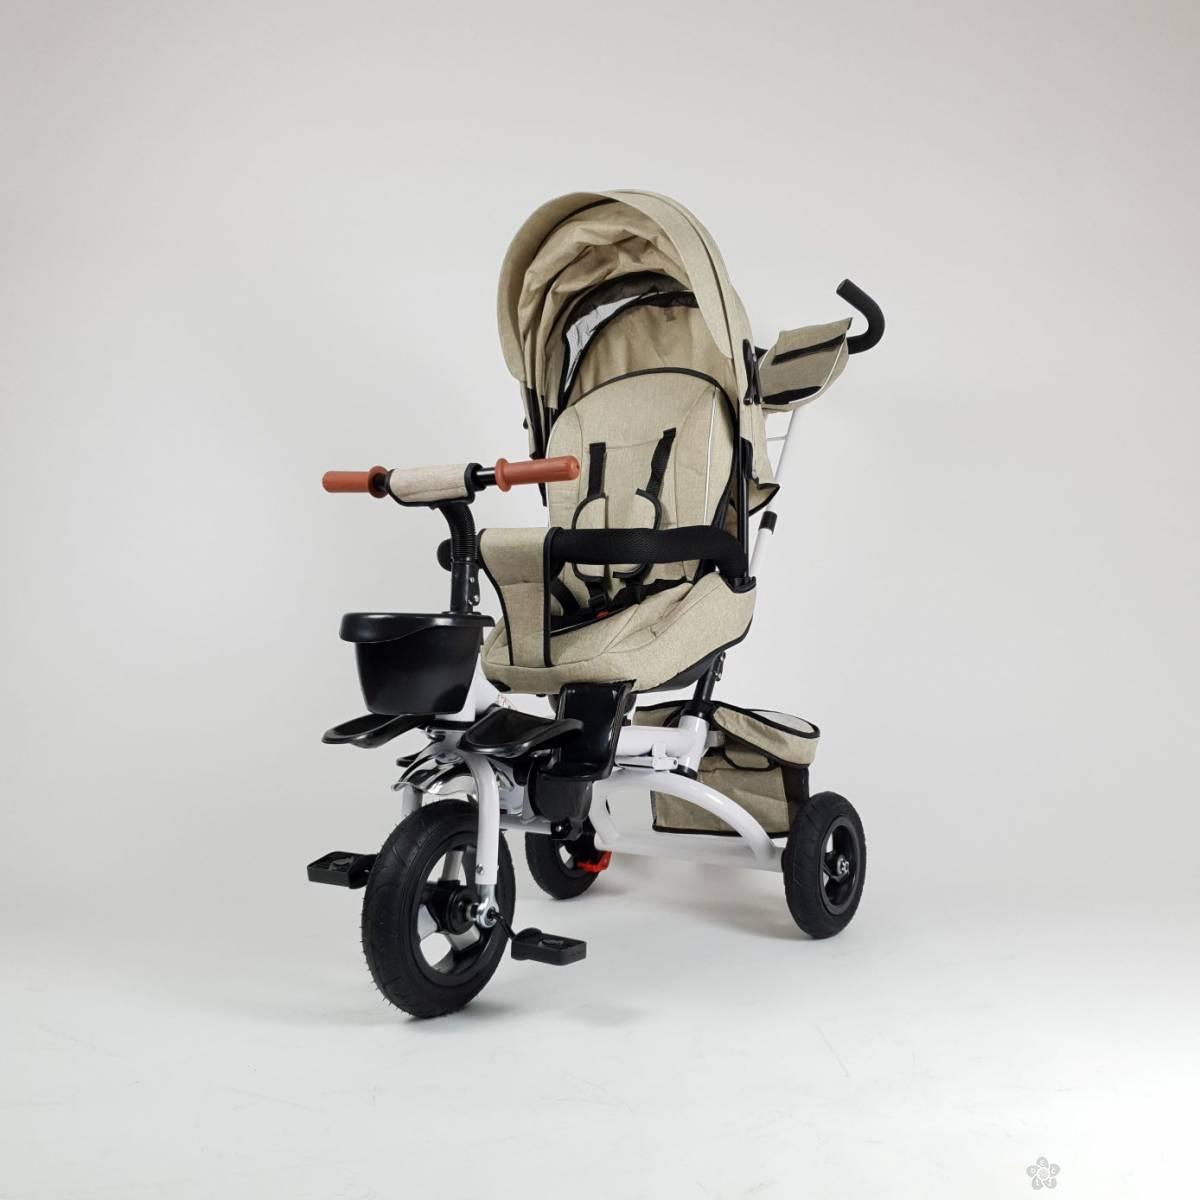 Tricikl Happybike Lux 420, bež